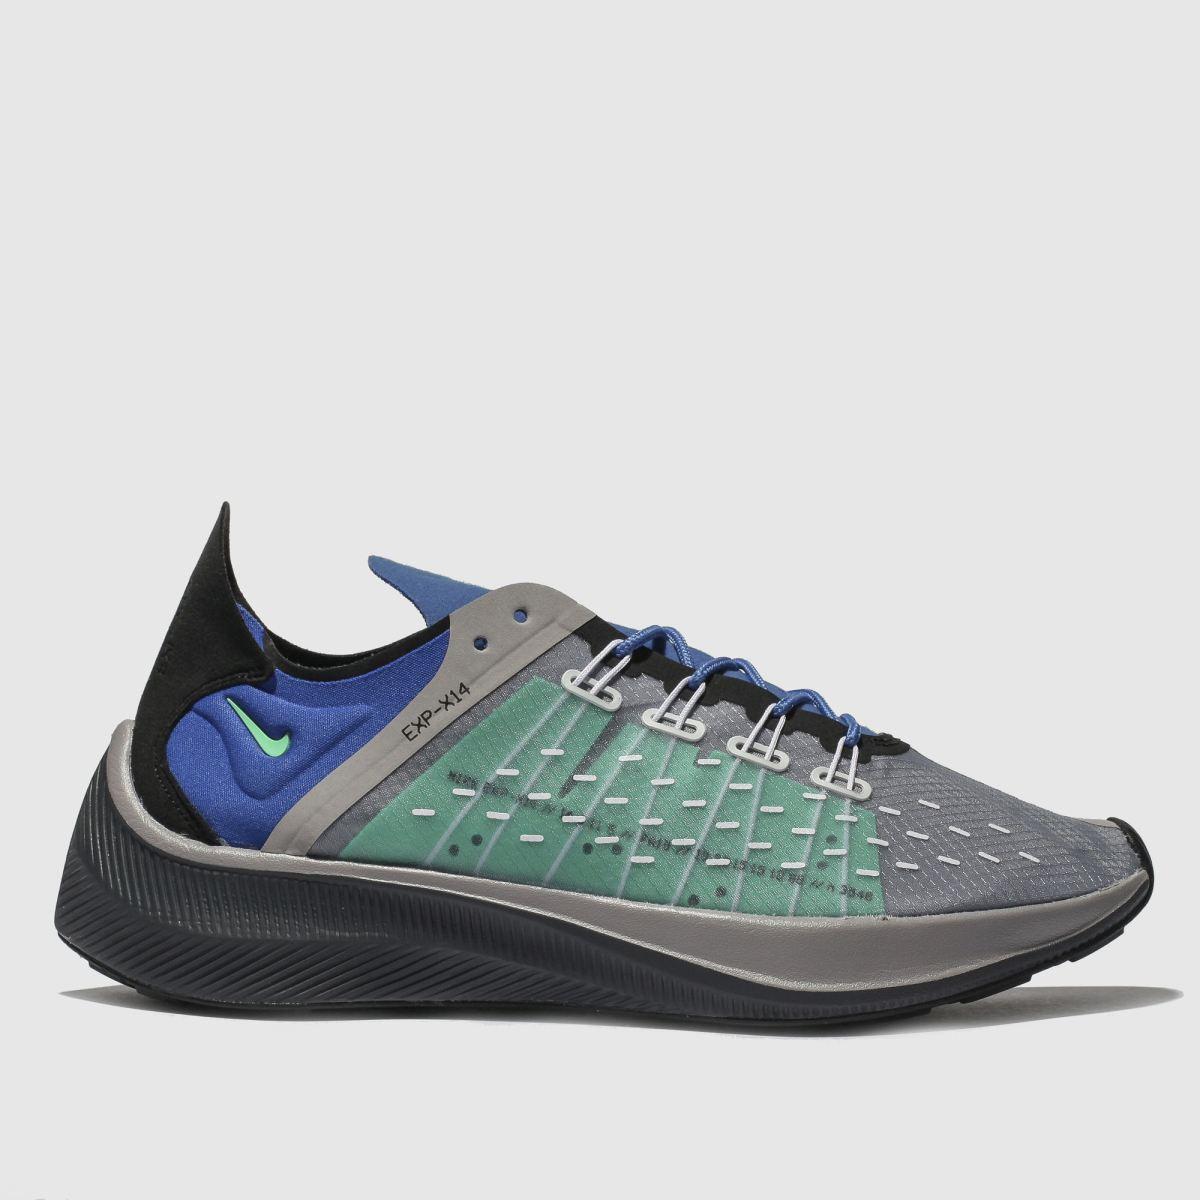 Nike Blue Exp-x14 Trainers